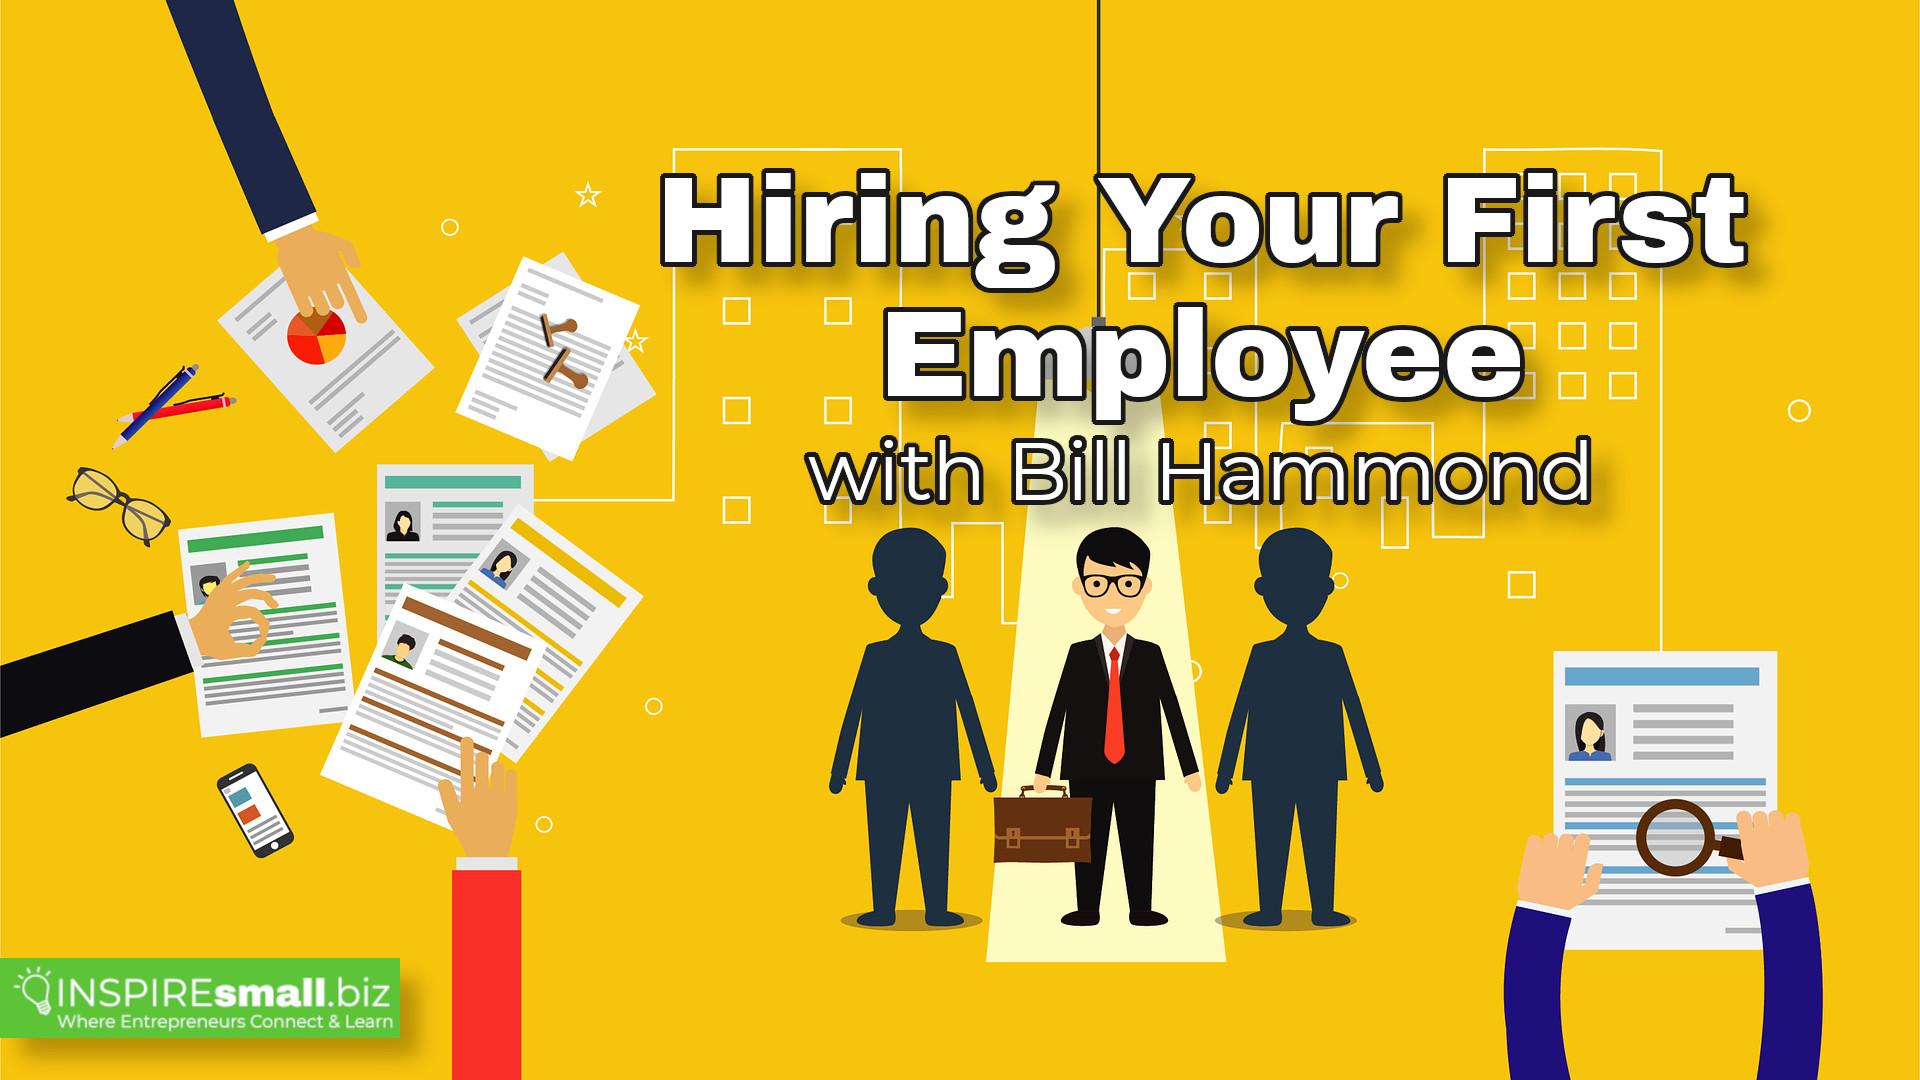 Hiring Your First Employee - INSPIREsmall.biz Monday Networking